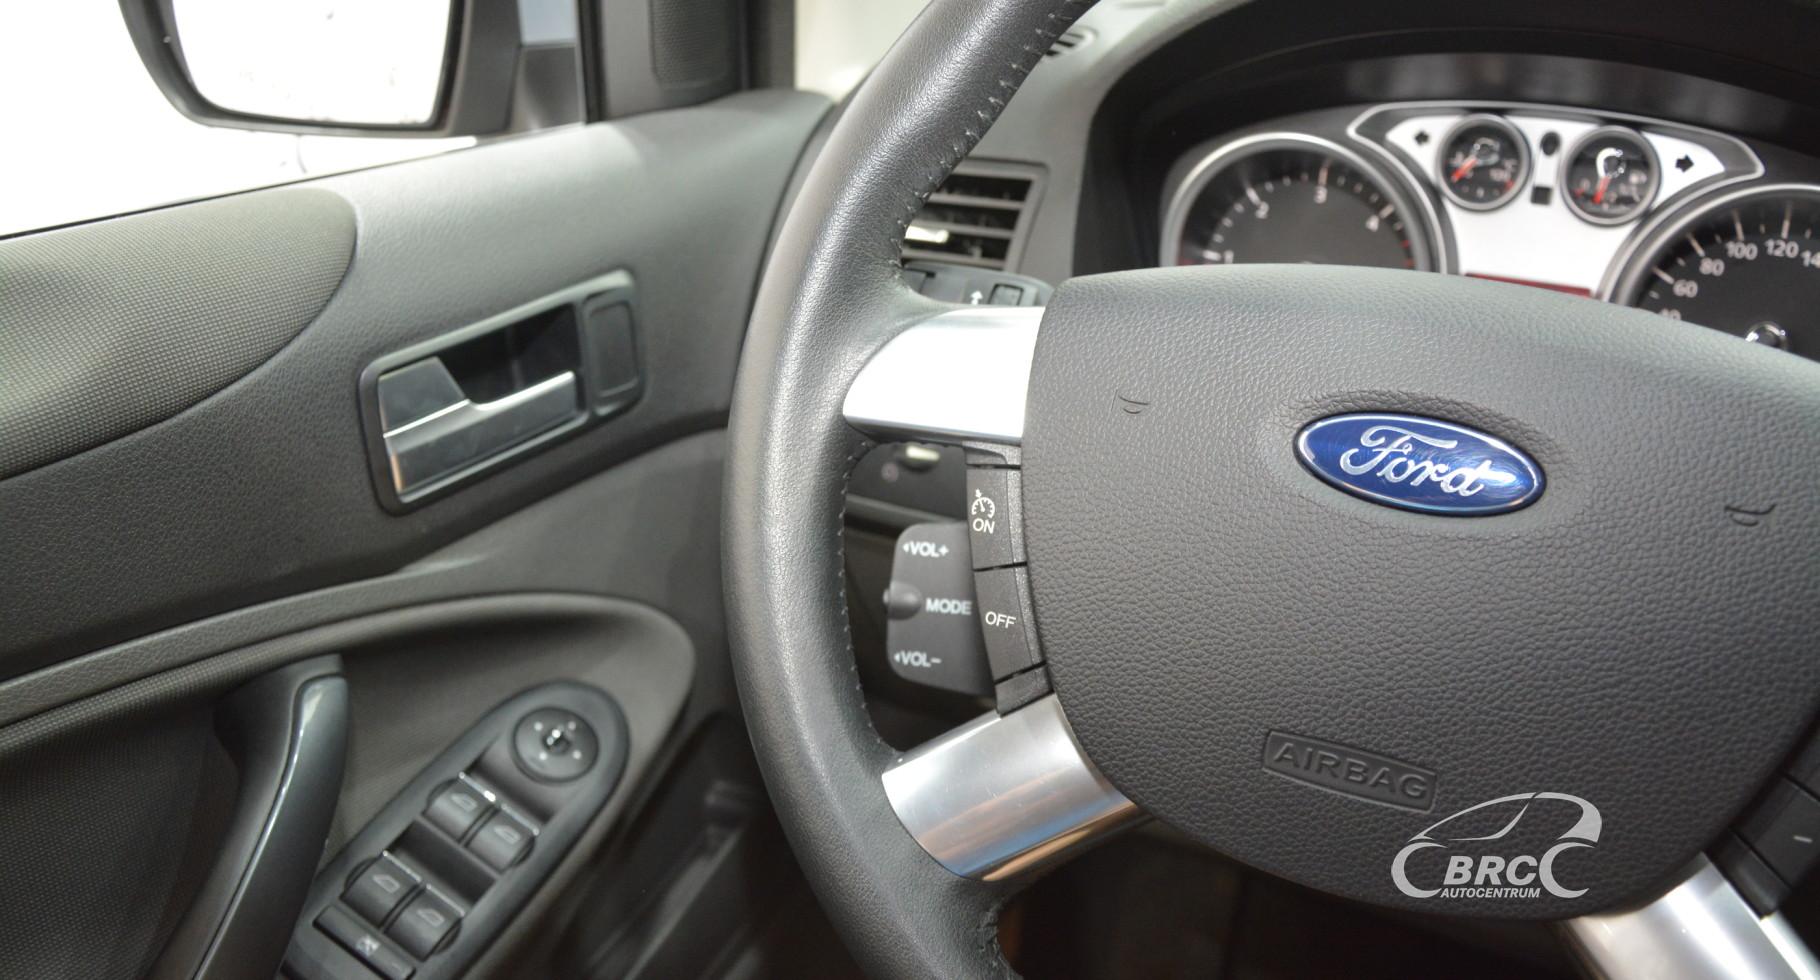 Ford Kuga 2.0 TDCi Automatas